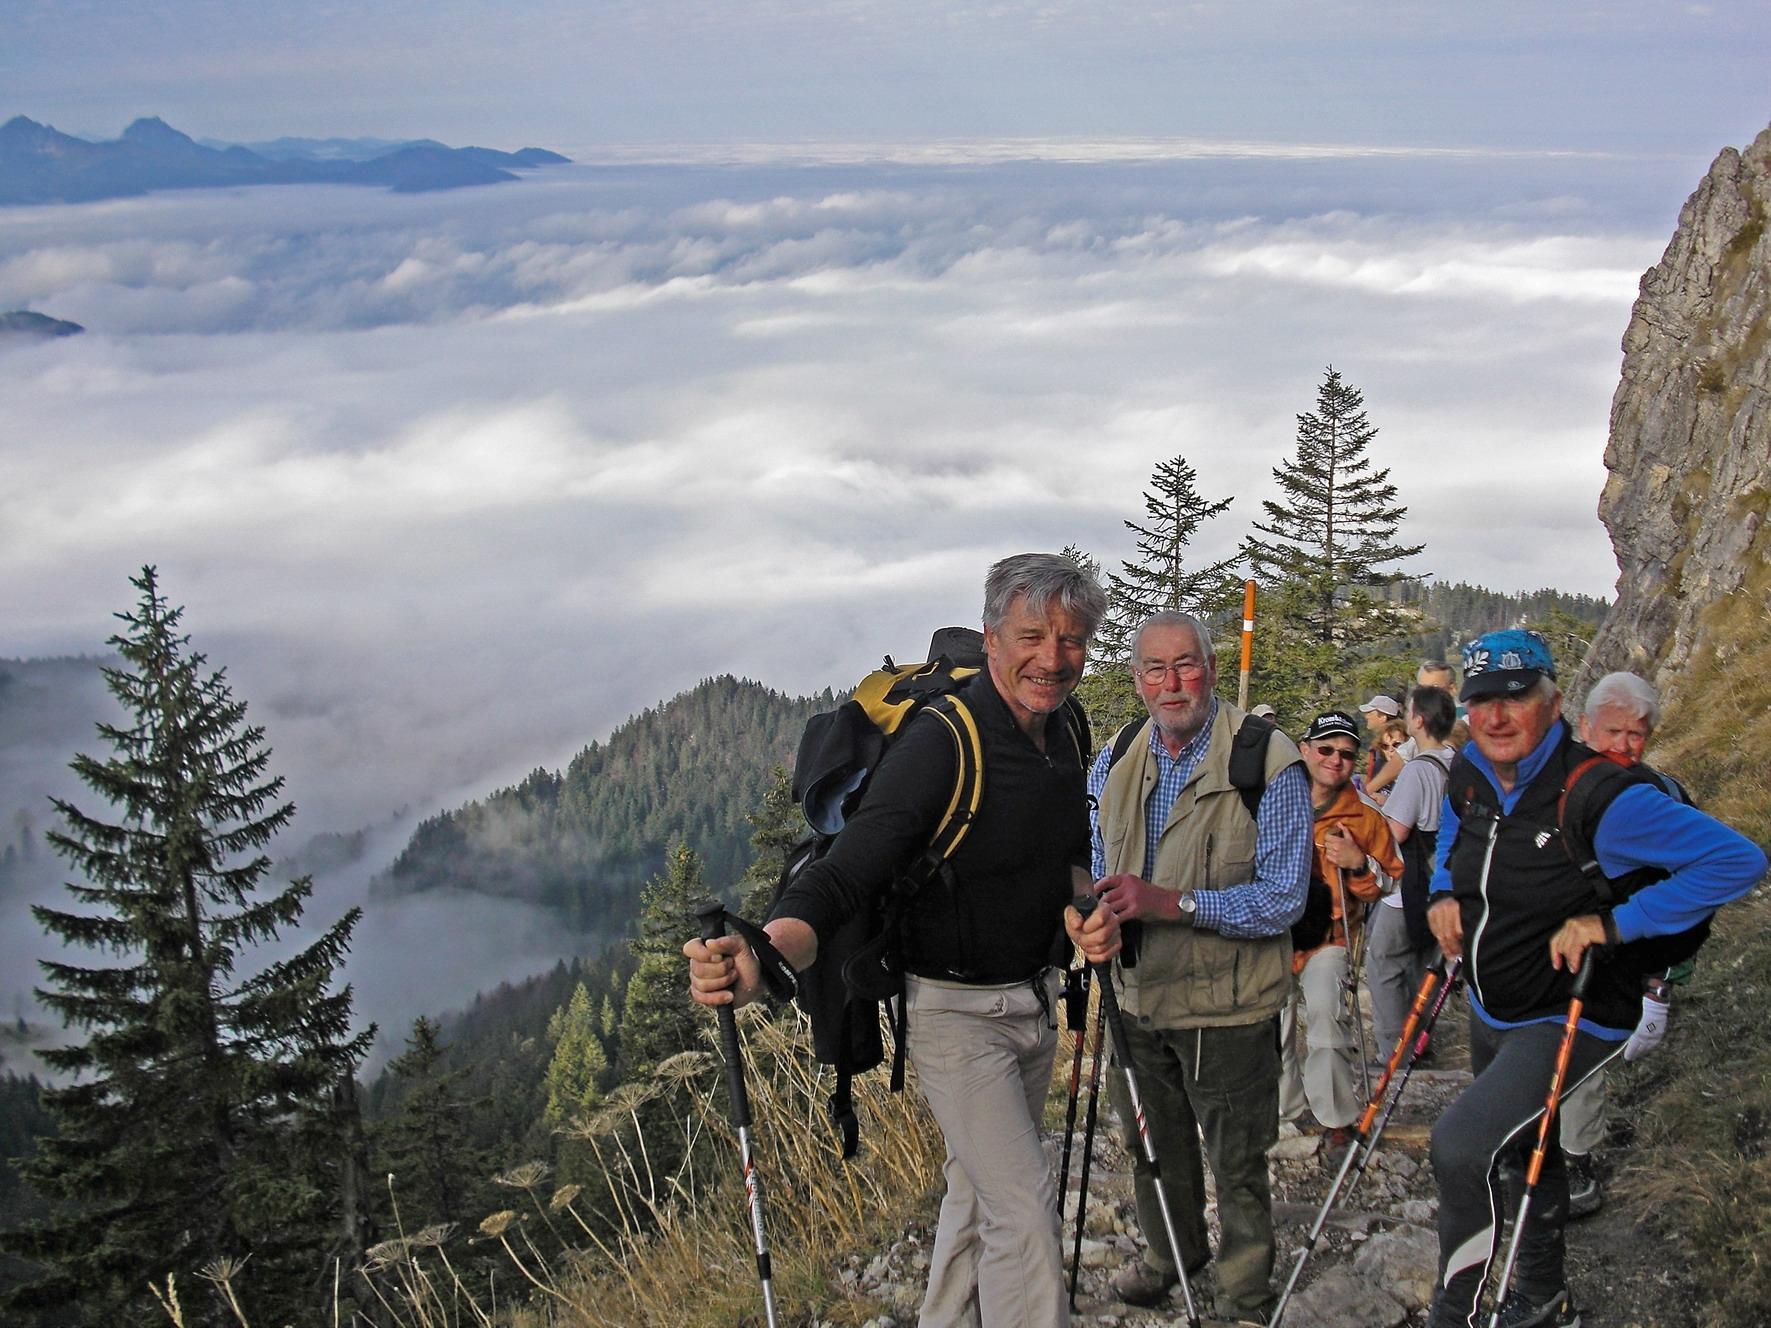 THE 10 BEST Bavarian Alps Tours - Tripadvisor